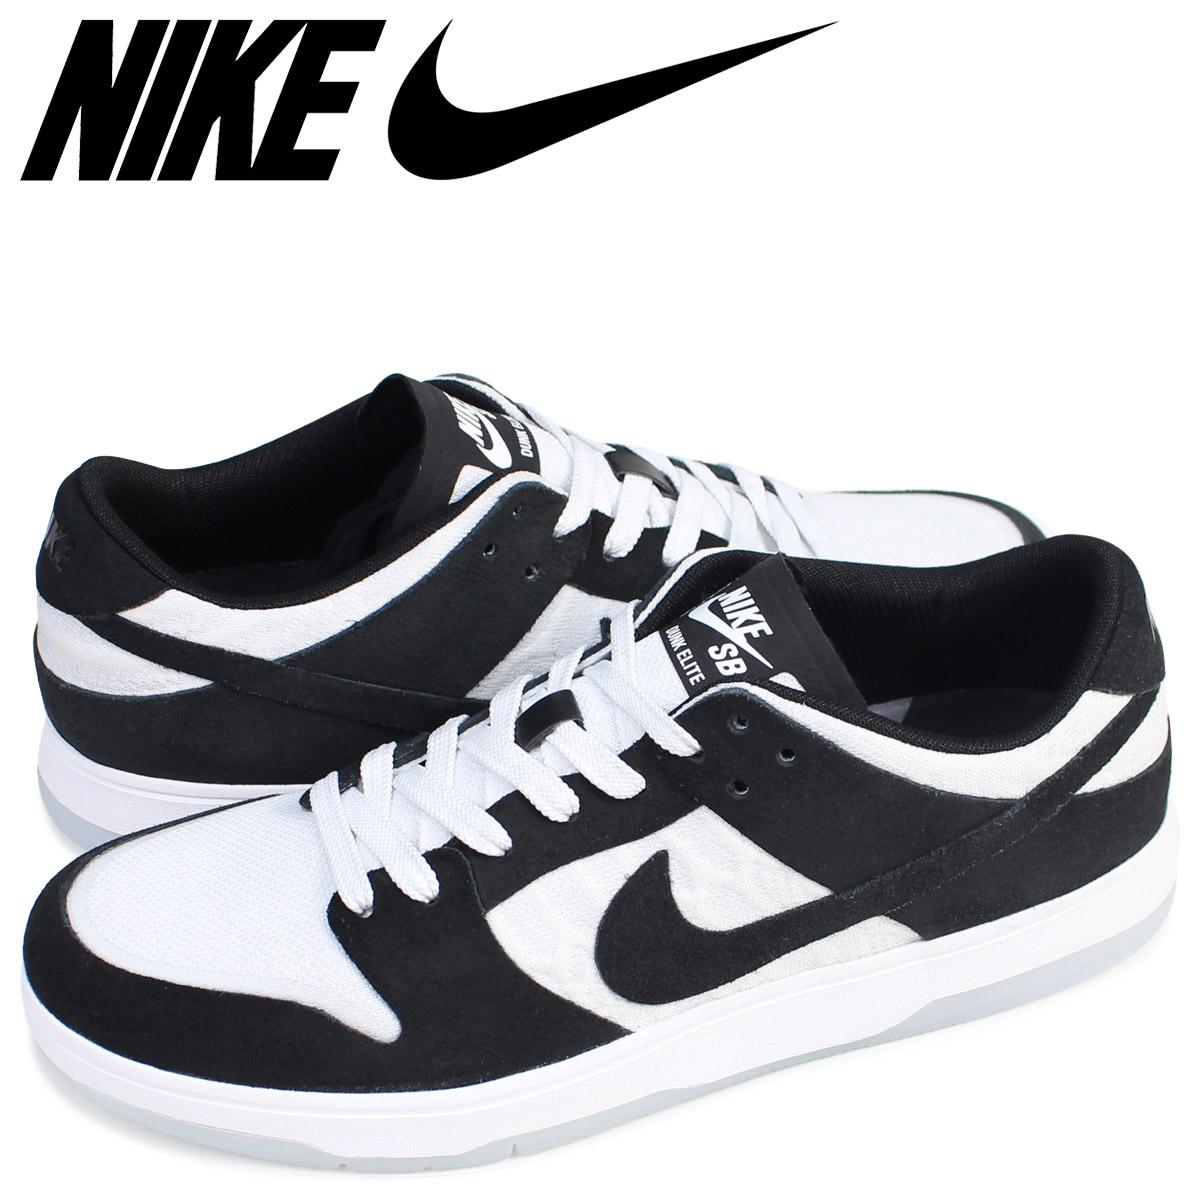 half off b8b9c 9c592 NIKE Nike SB dunk low sneakers ZOOM DUNK LOW ELITE QS OSKI 877,063-001  men's shoes black black